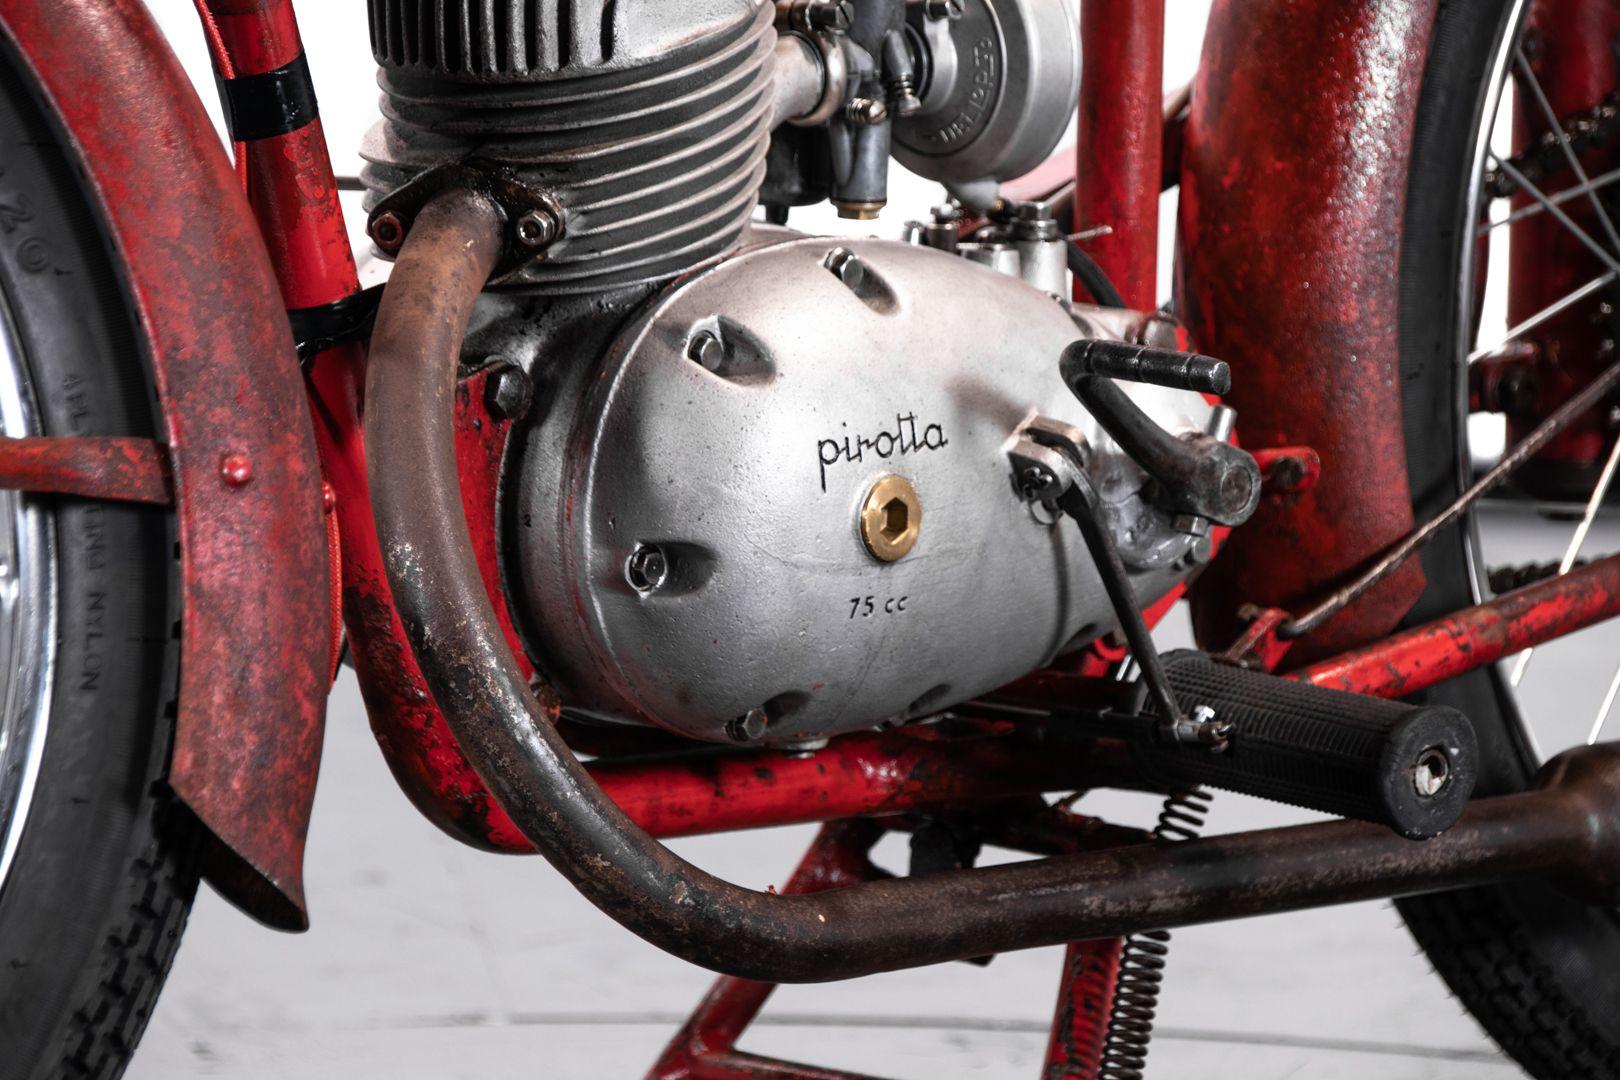 1954 Pirotta 75cc 85035